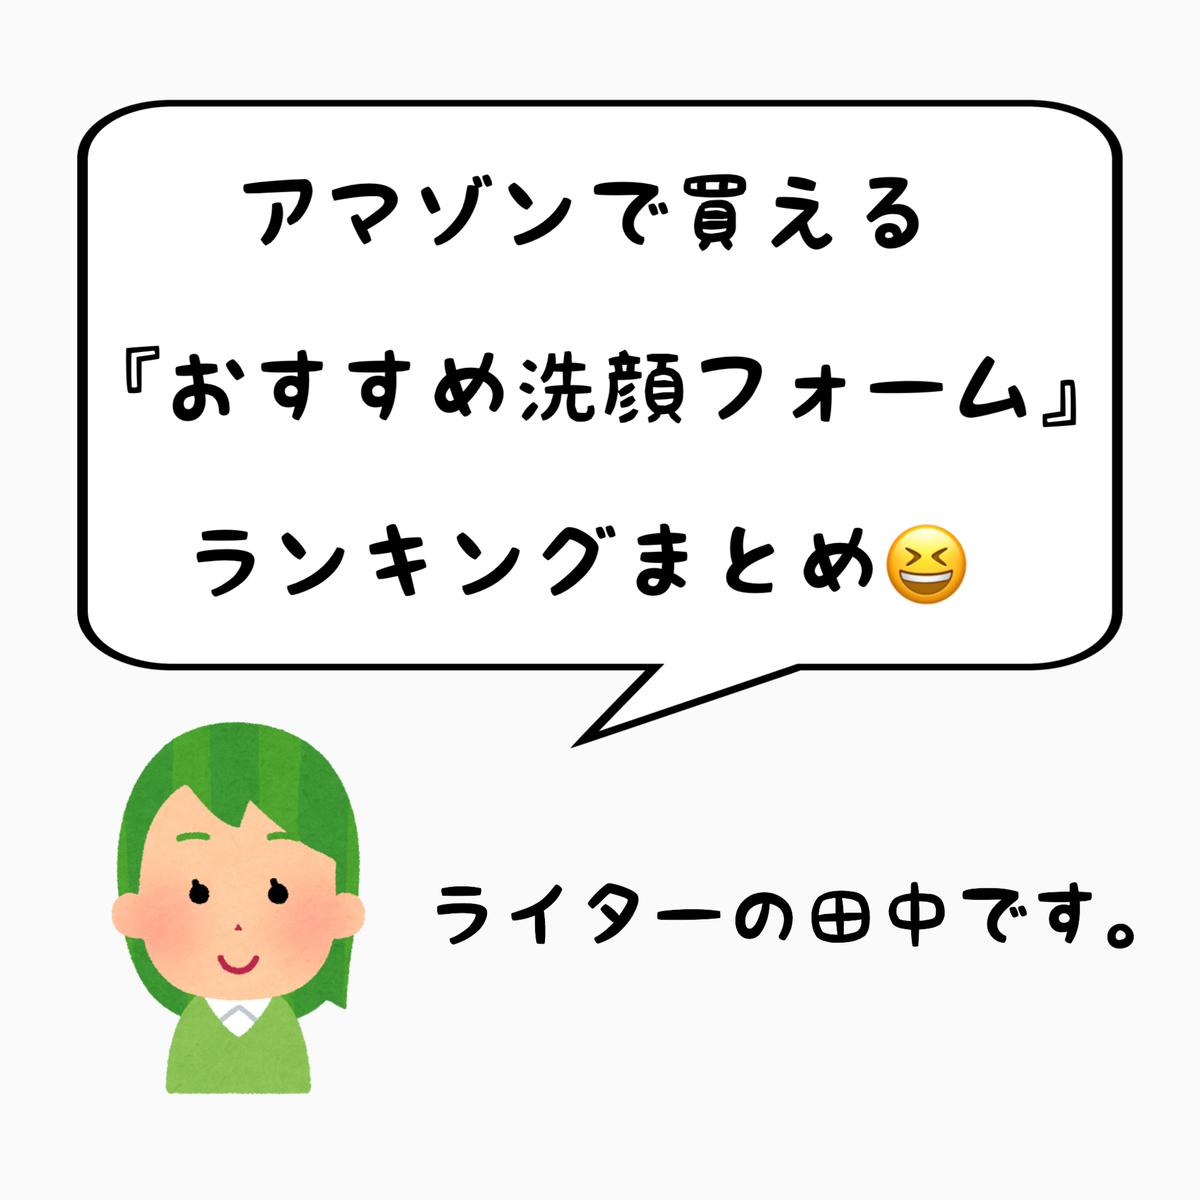 f:id:nokonoko_o:20201017183803j:plain